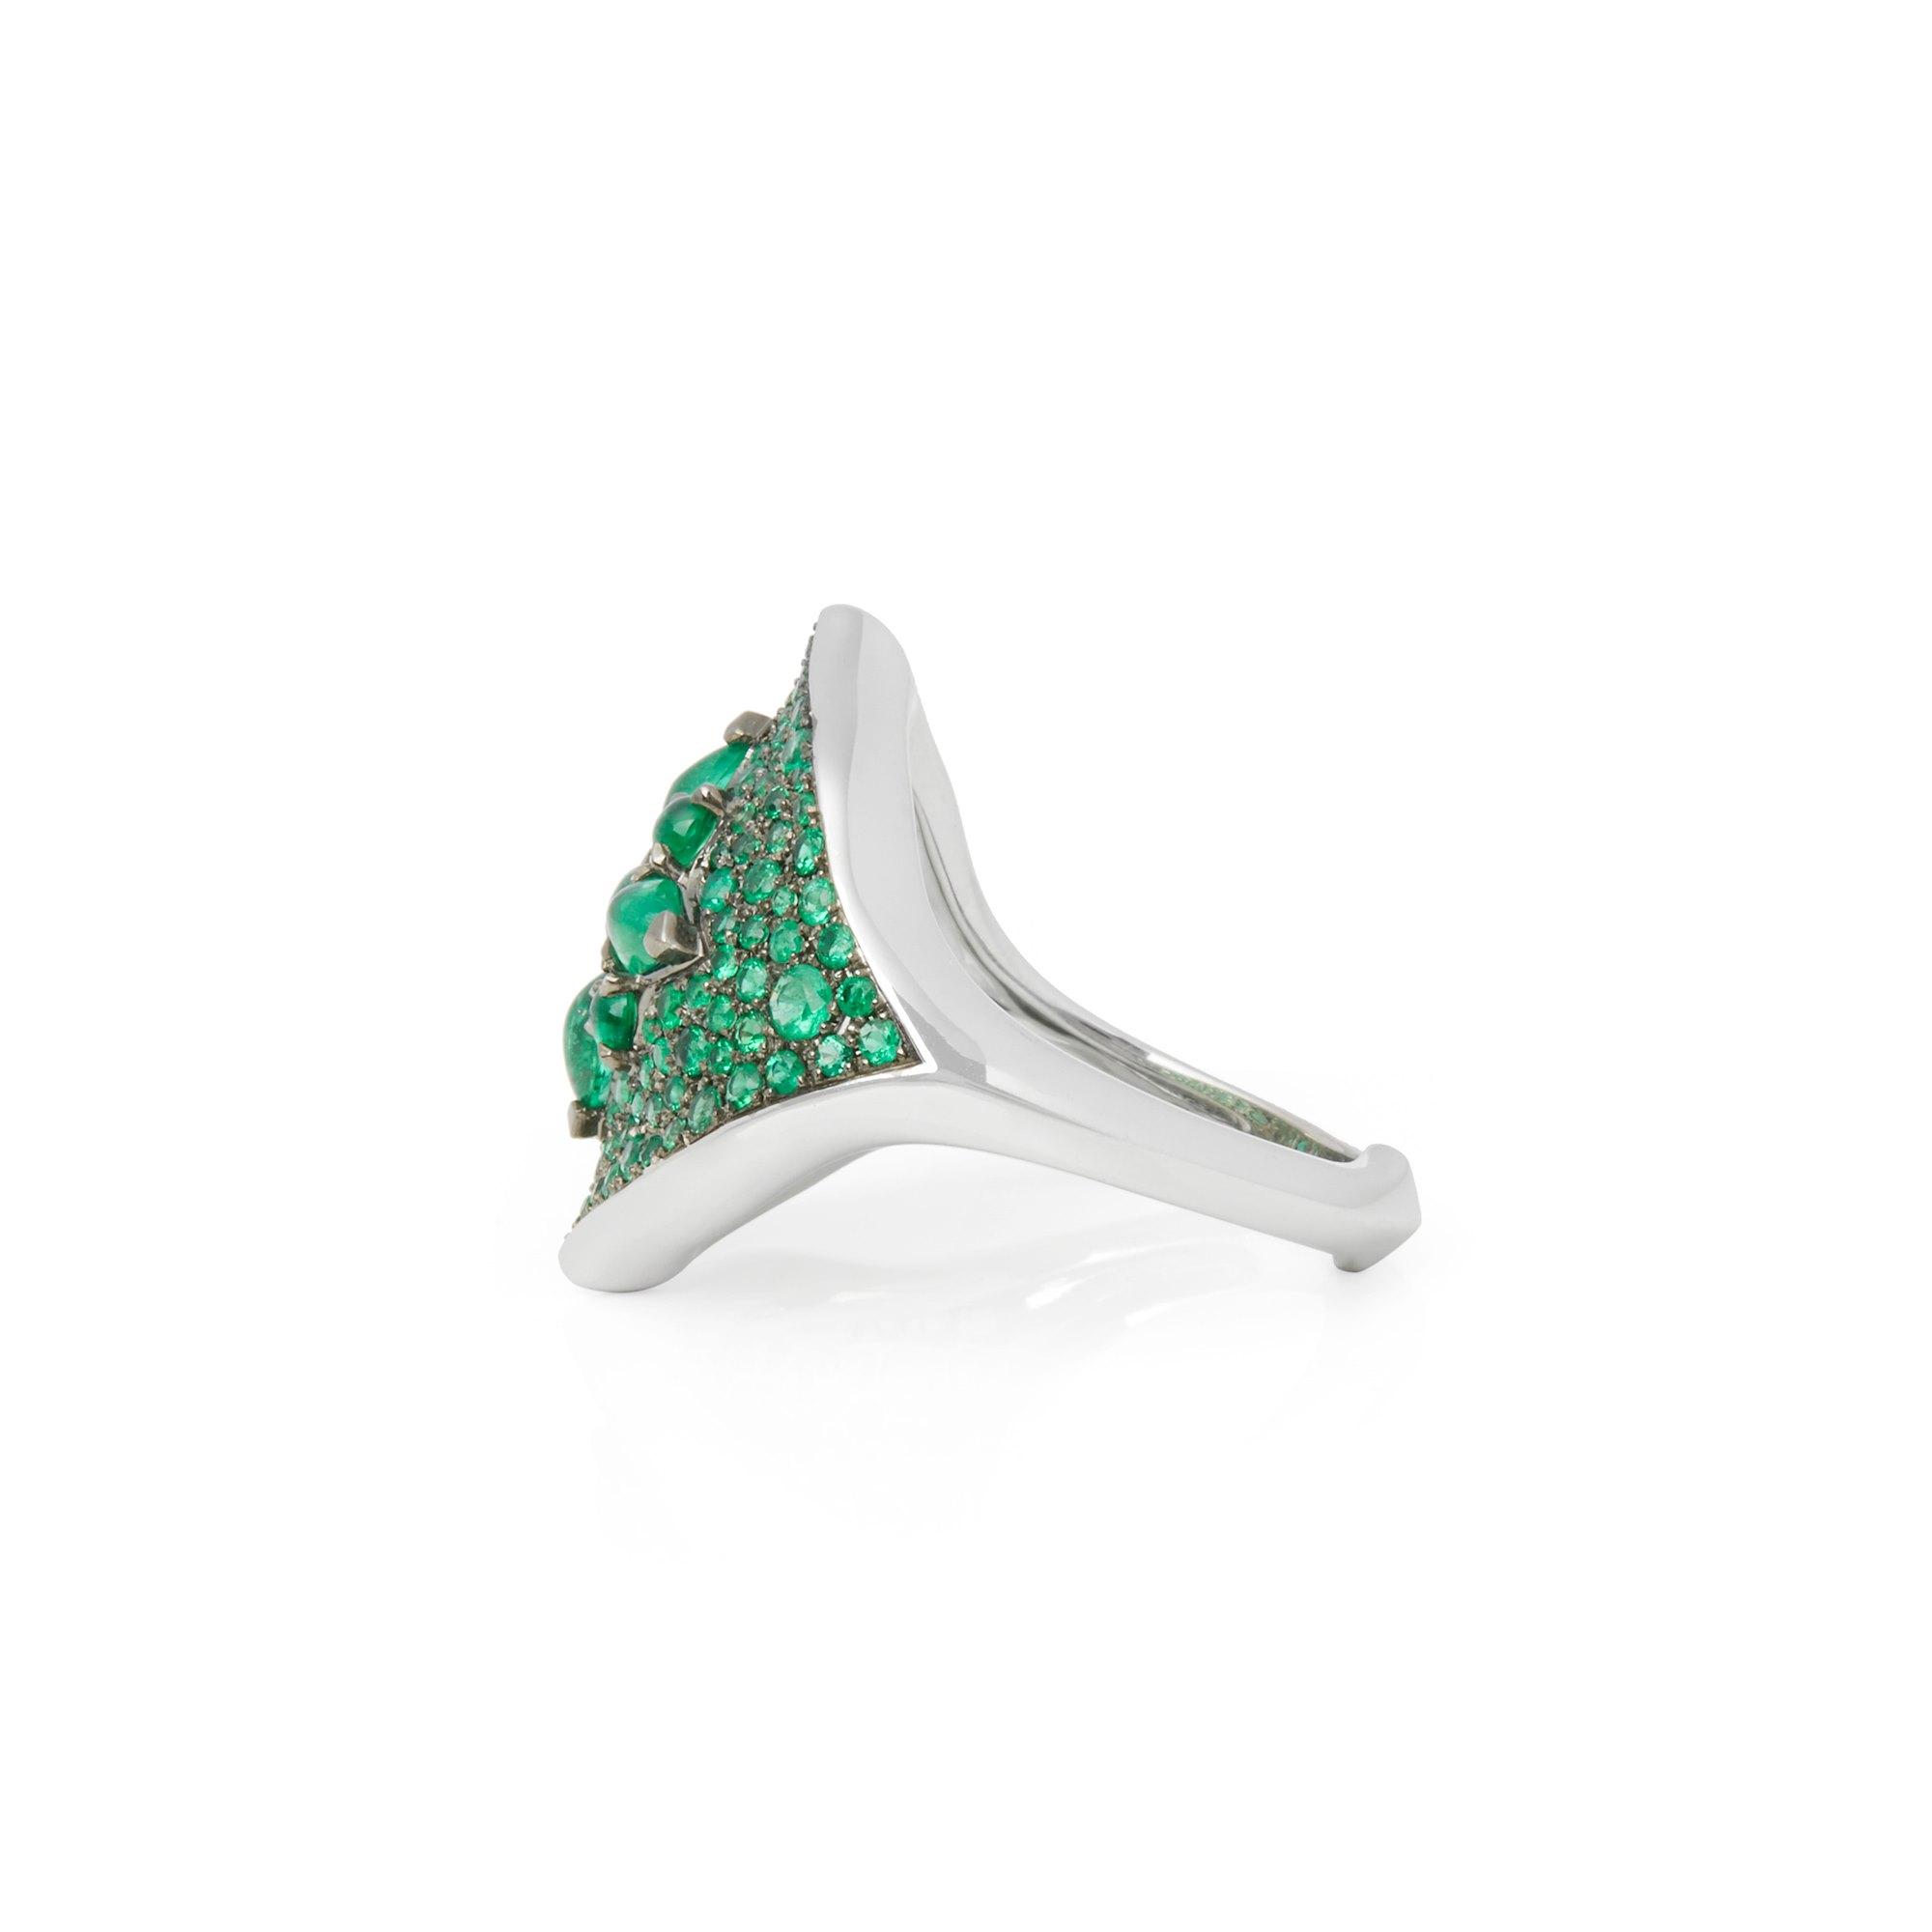 Stephen Webster Belle Epoque 18ct White Gold Emerald Ring